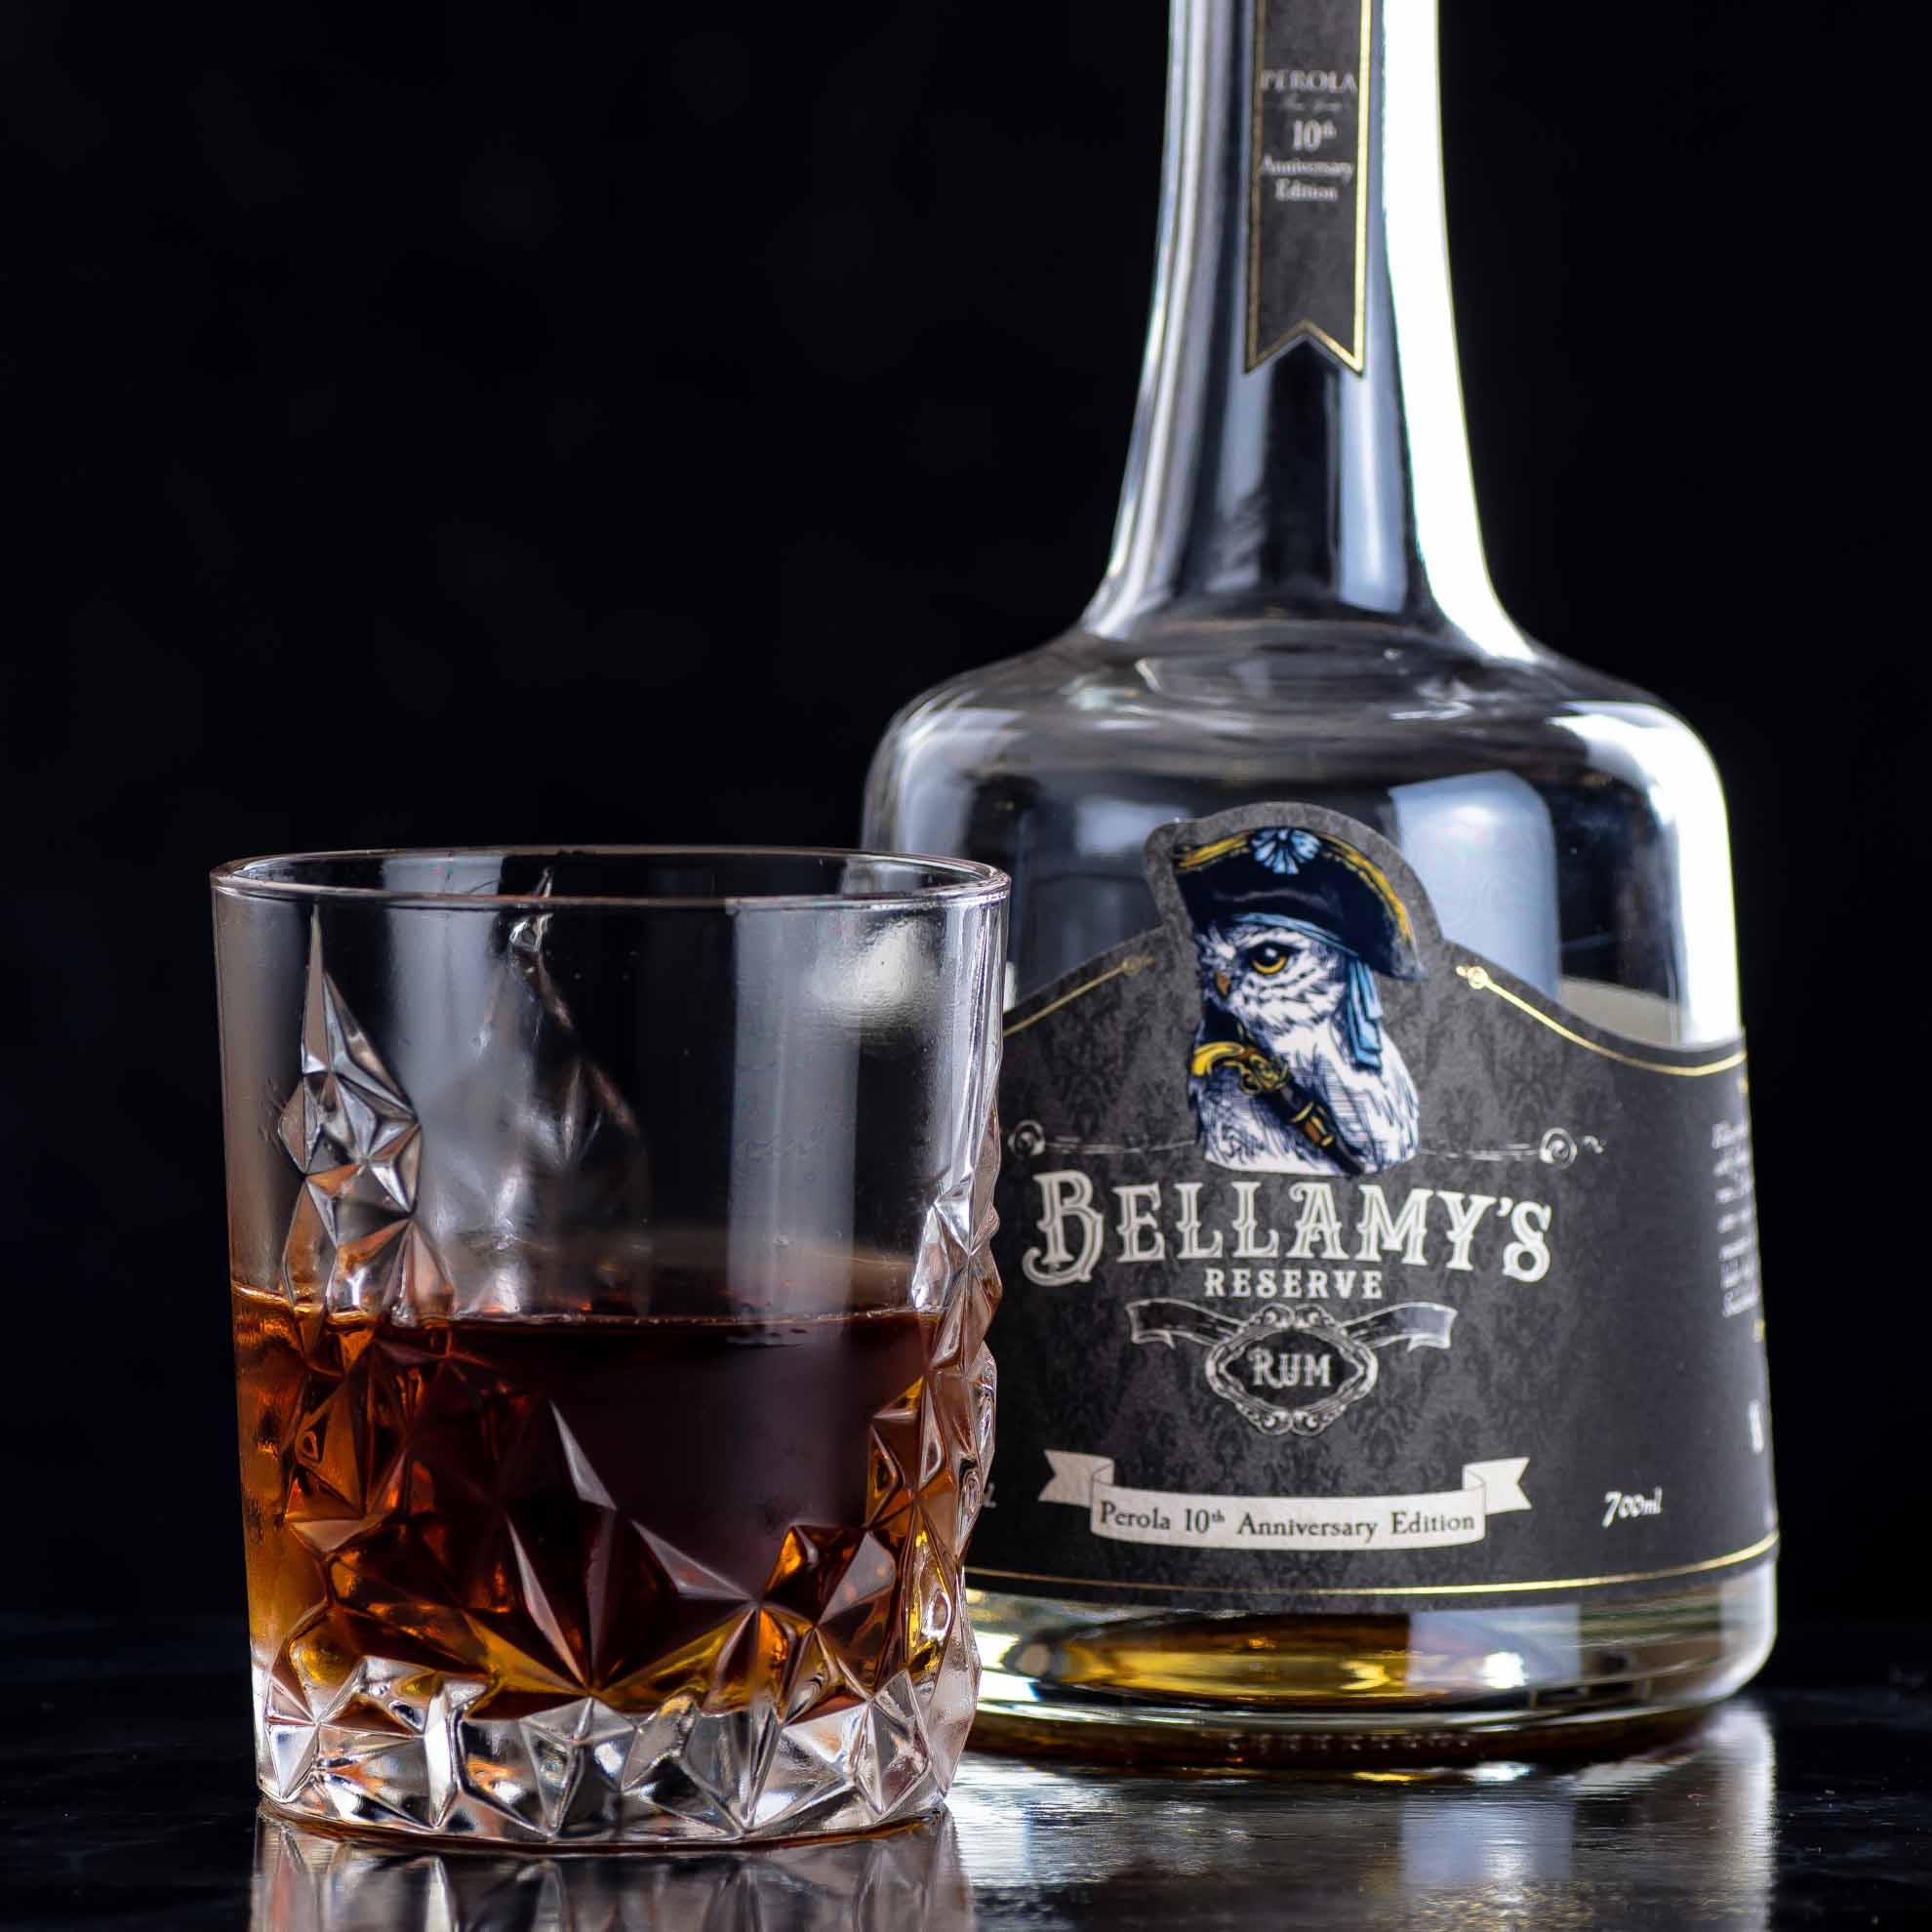 100 Year Old Cigar mit Bellamy's Rum 10th Anniversary Edition.